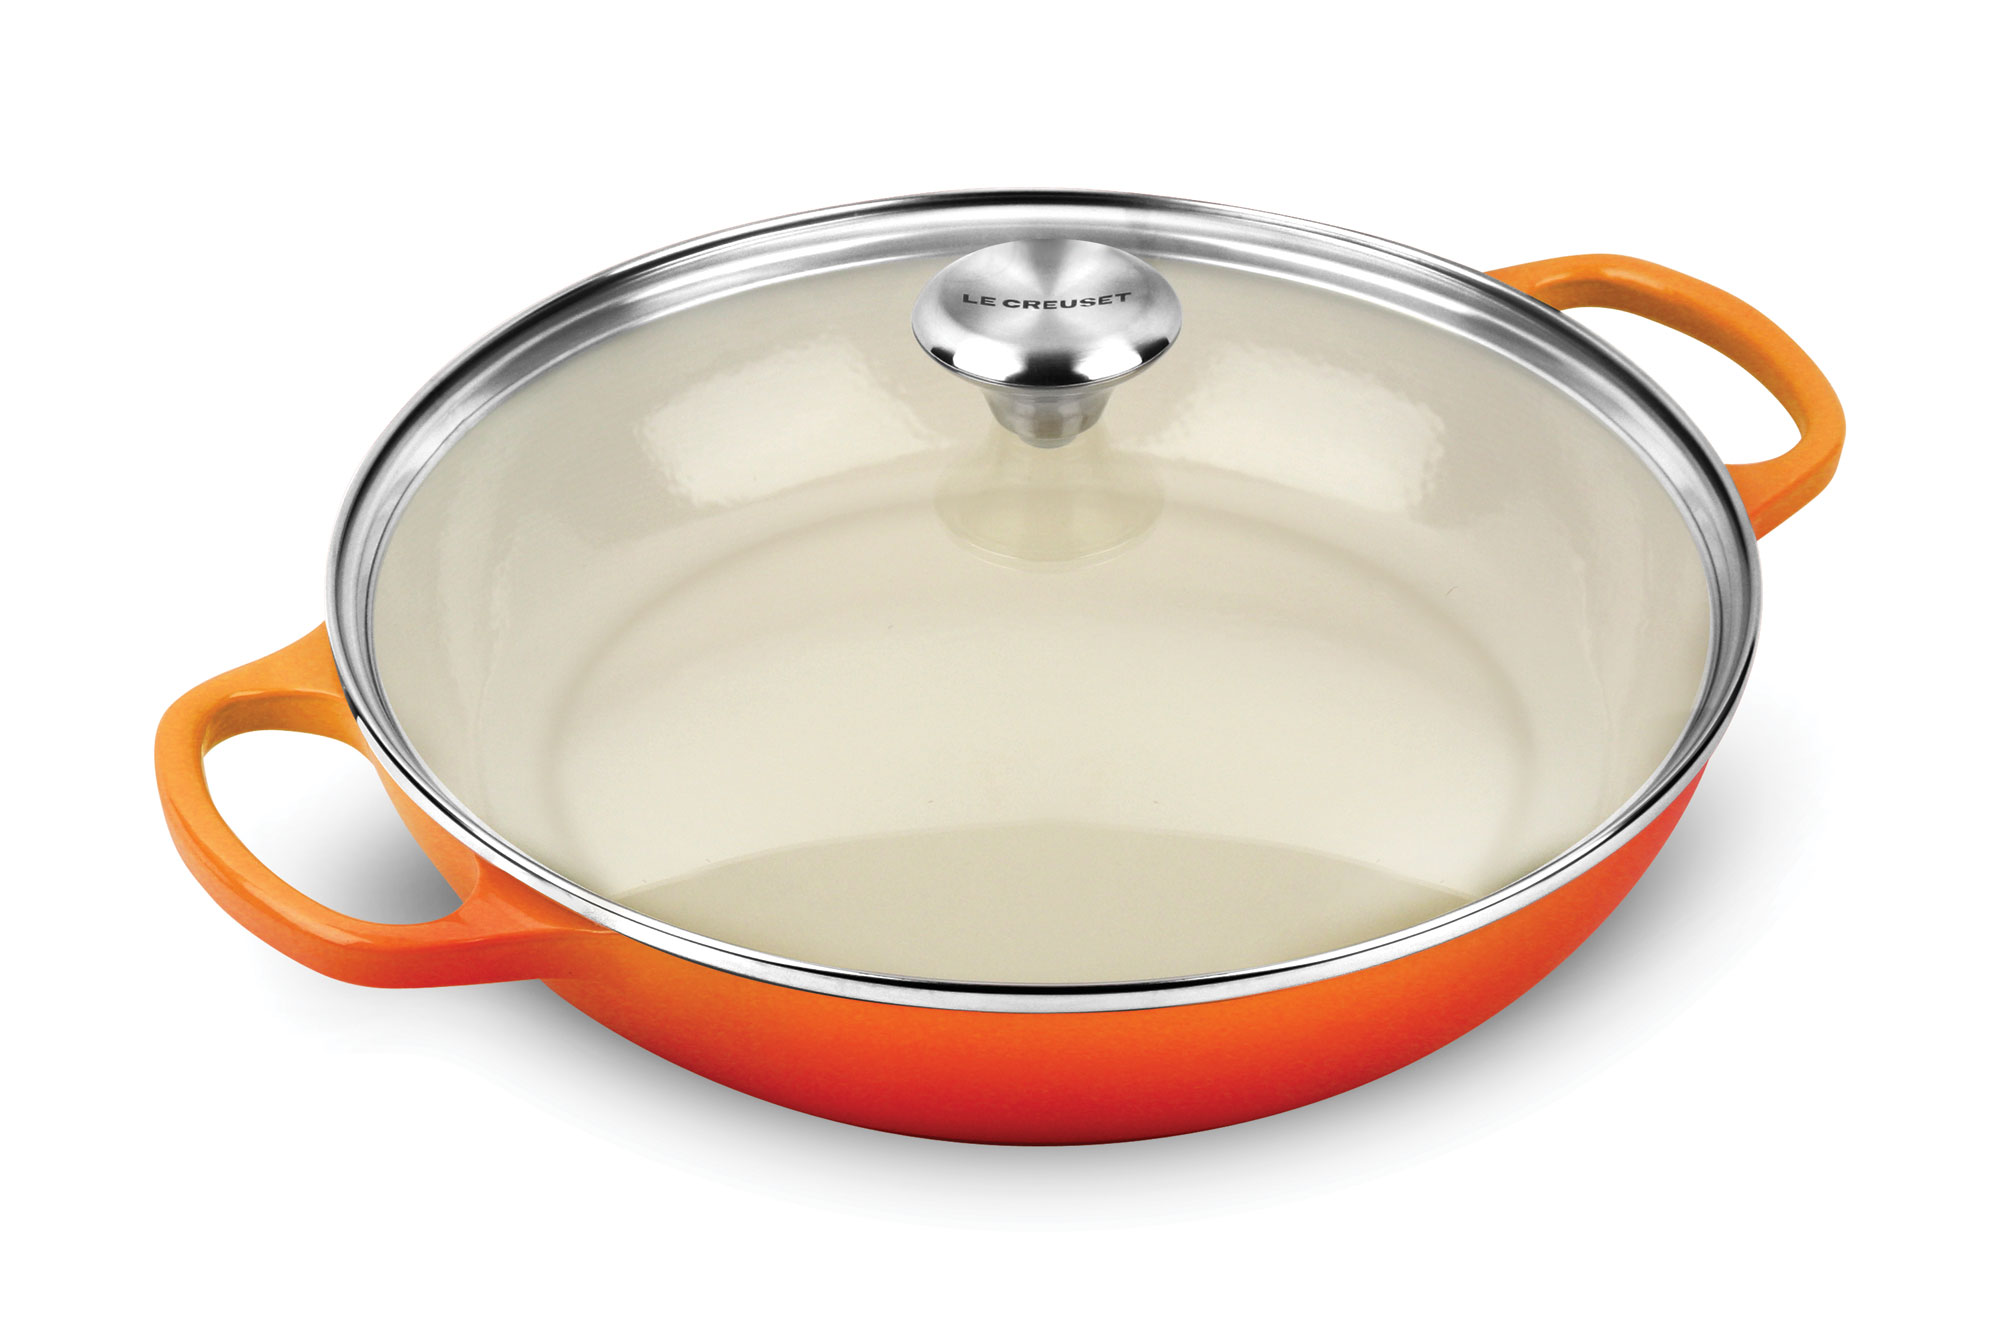 le creuset signature cast iron buffet casserole with glass lid 3 5 rh cutleryandmore com le creuset buffet casserole 26cm le creuset buffet casserole review